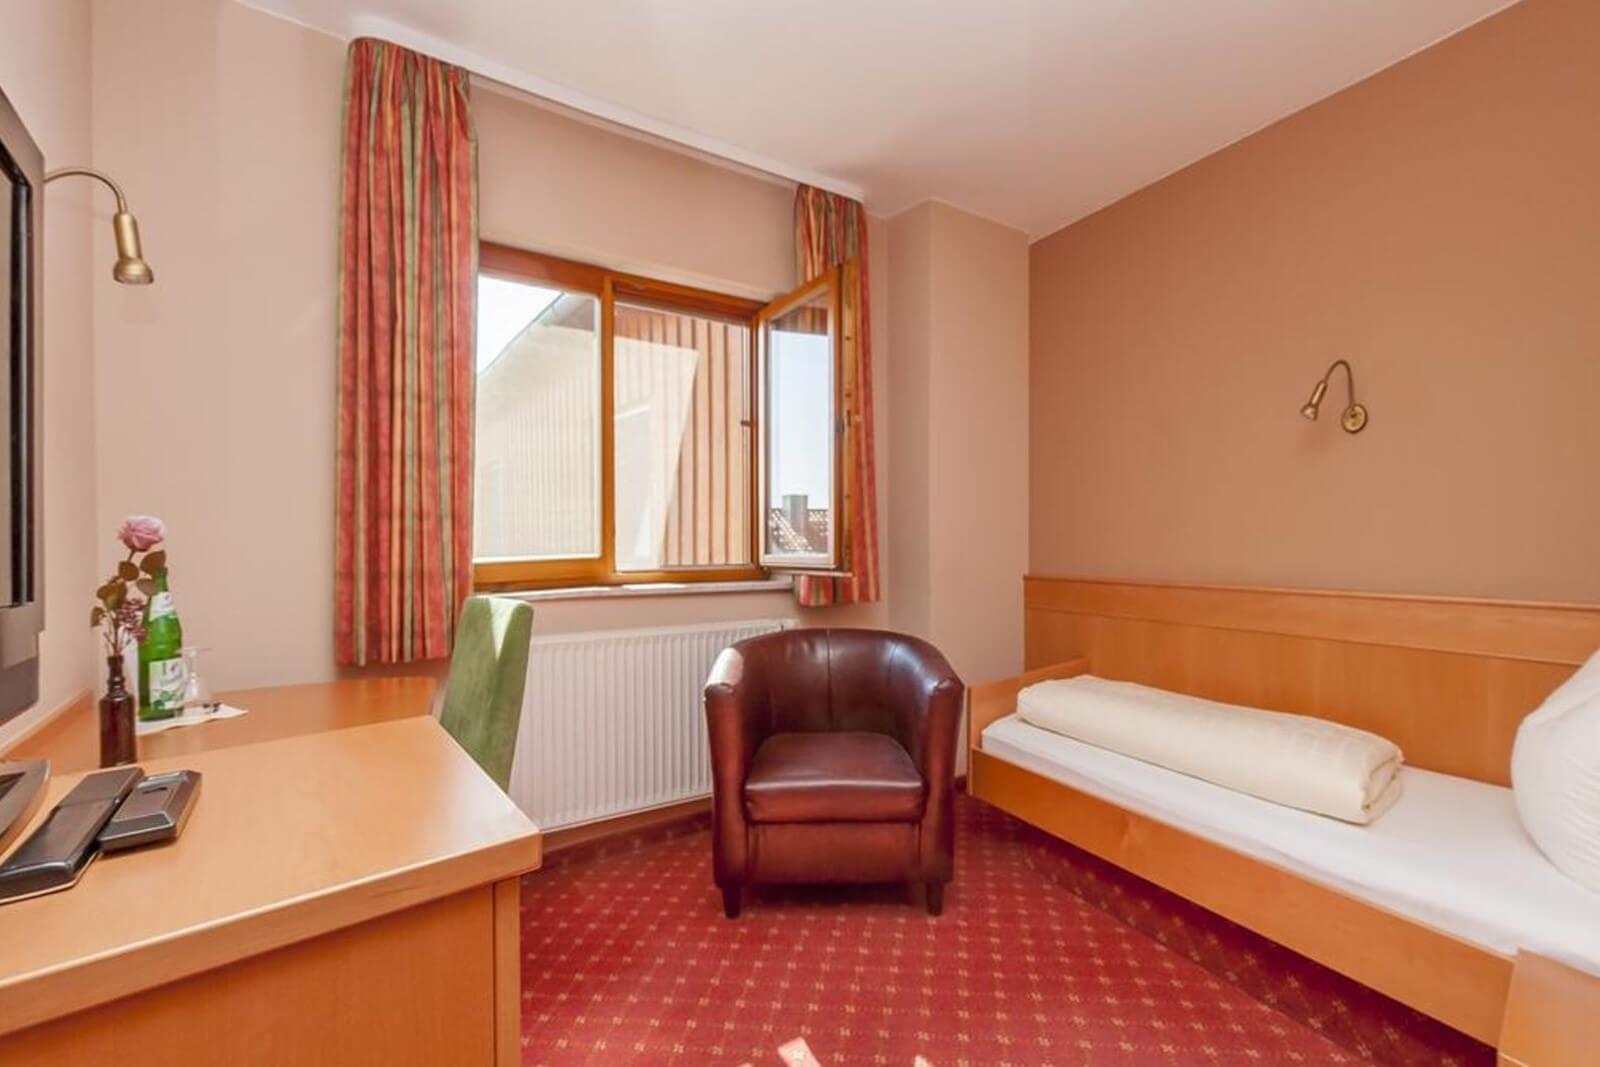 einzelzimmer-standard-hotel-pension-bett-fruehstueck-riedstadt4